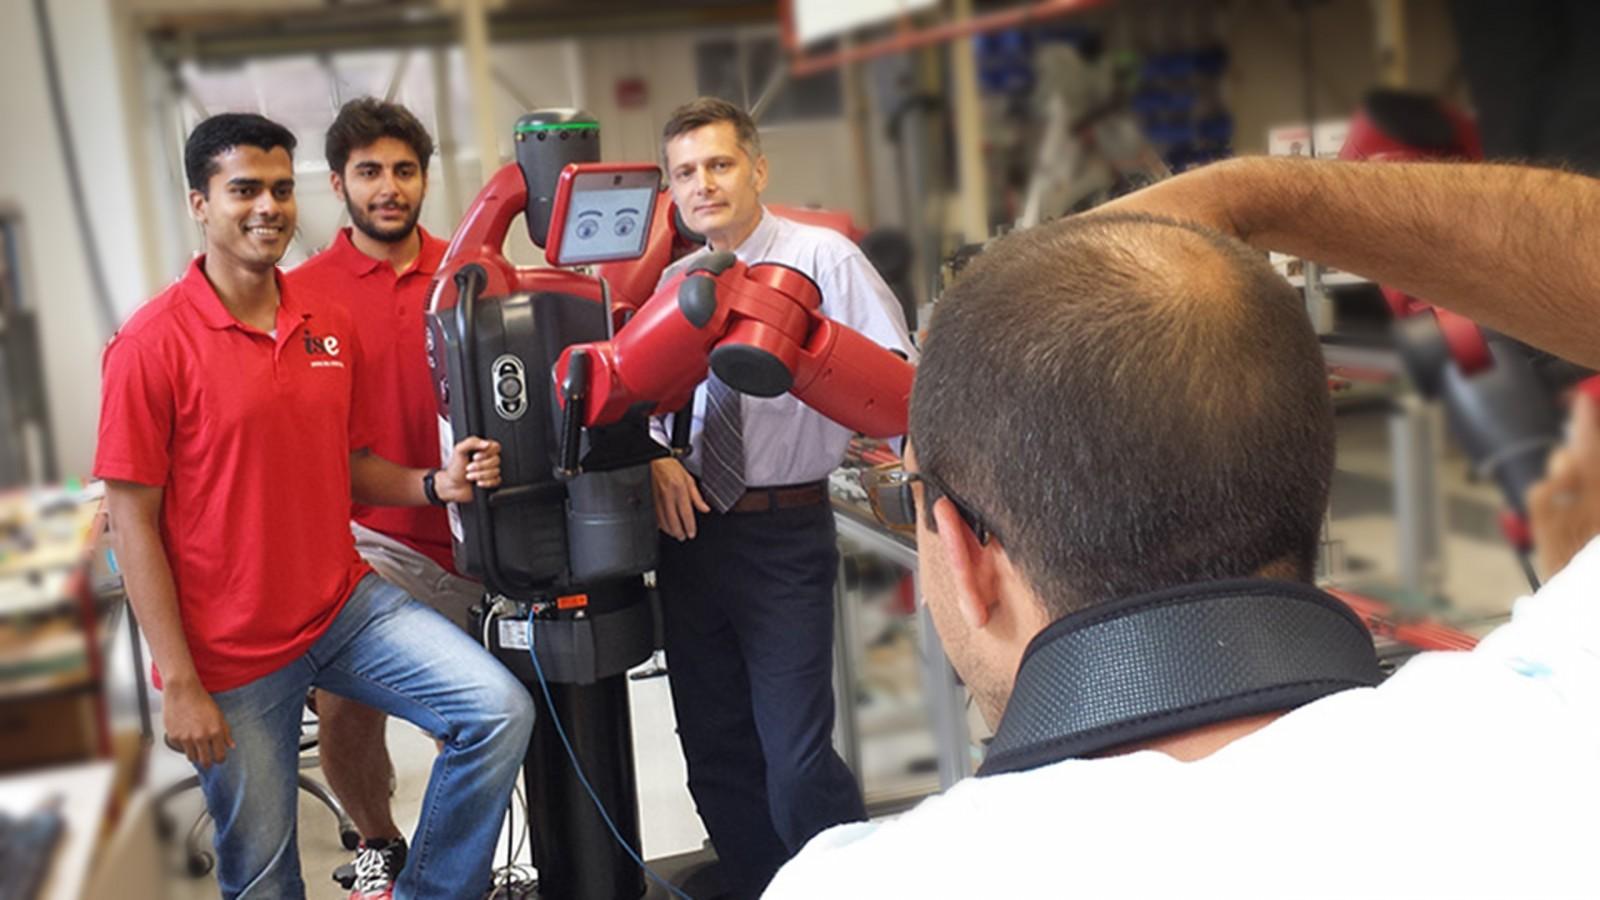 Rethink Robotics to Make ISE Video